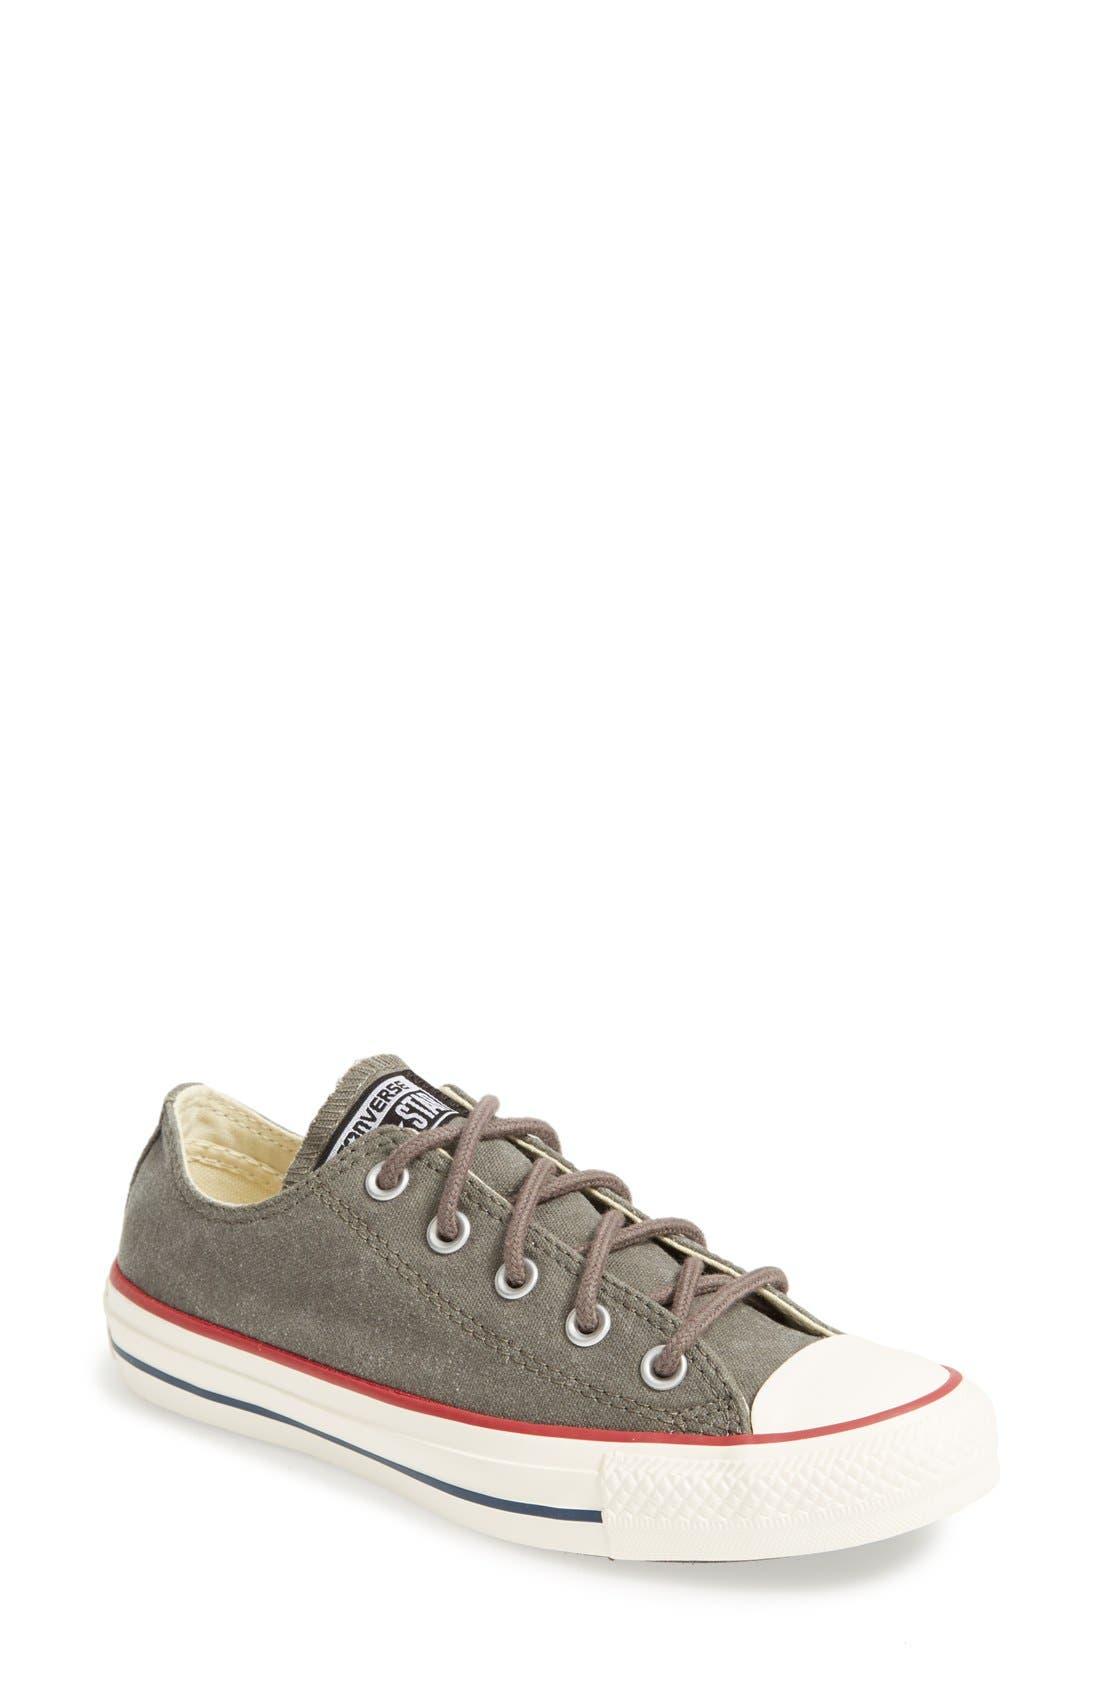 Main Image - Converse Chuck Taylor® All Star® 'Ox' Canvas Sneaker (Women)